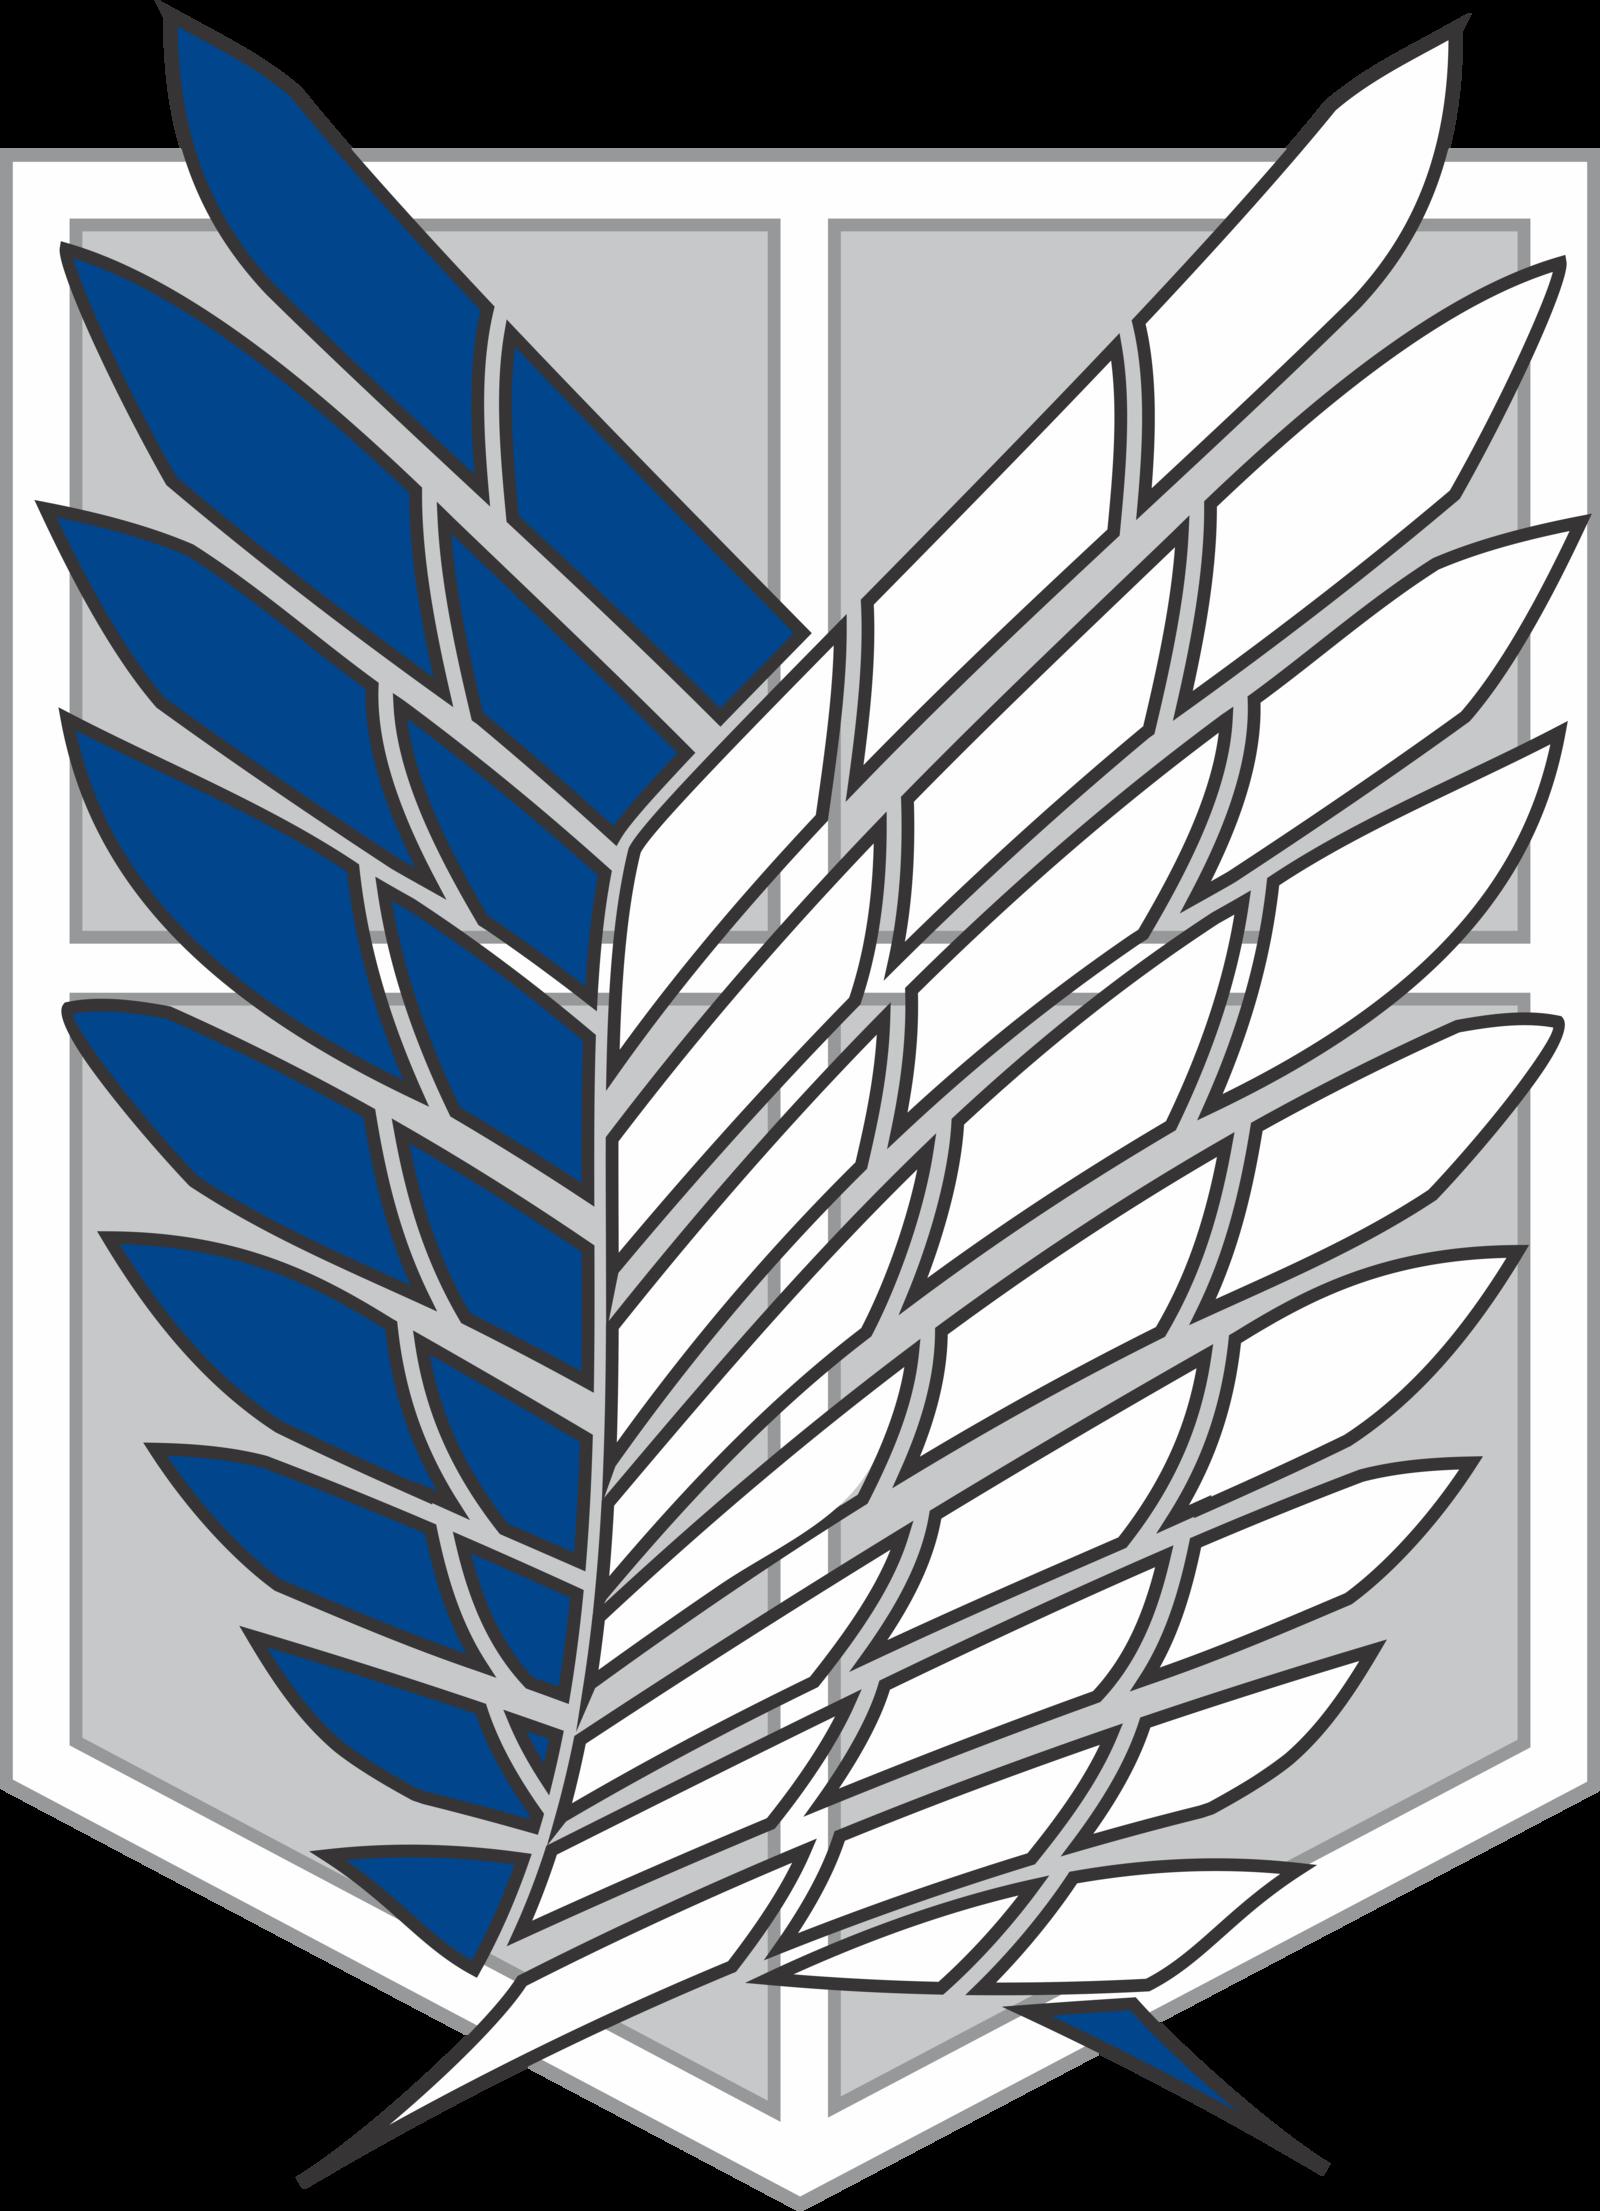 Aot Logos